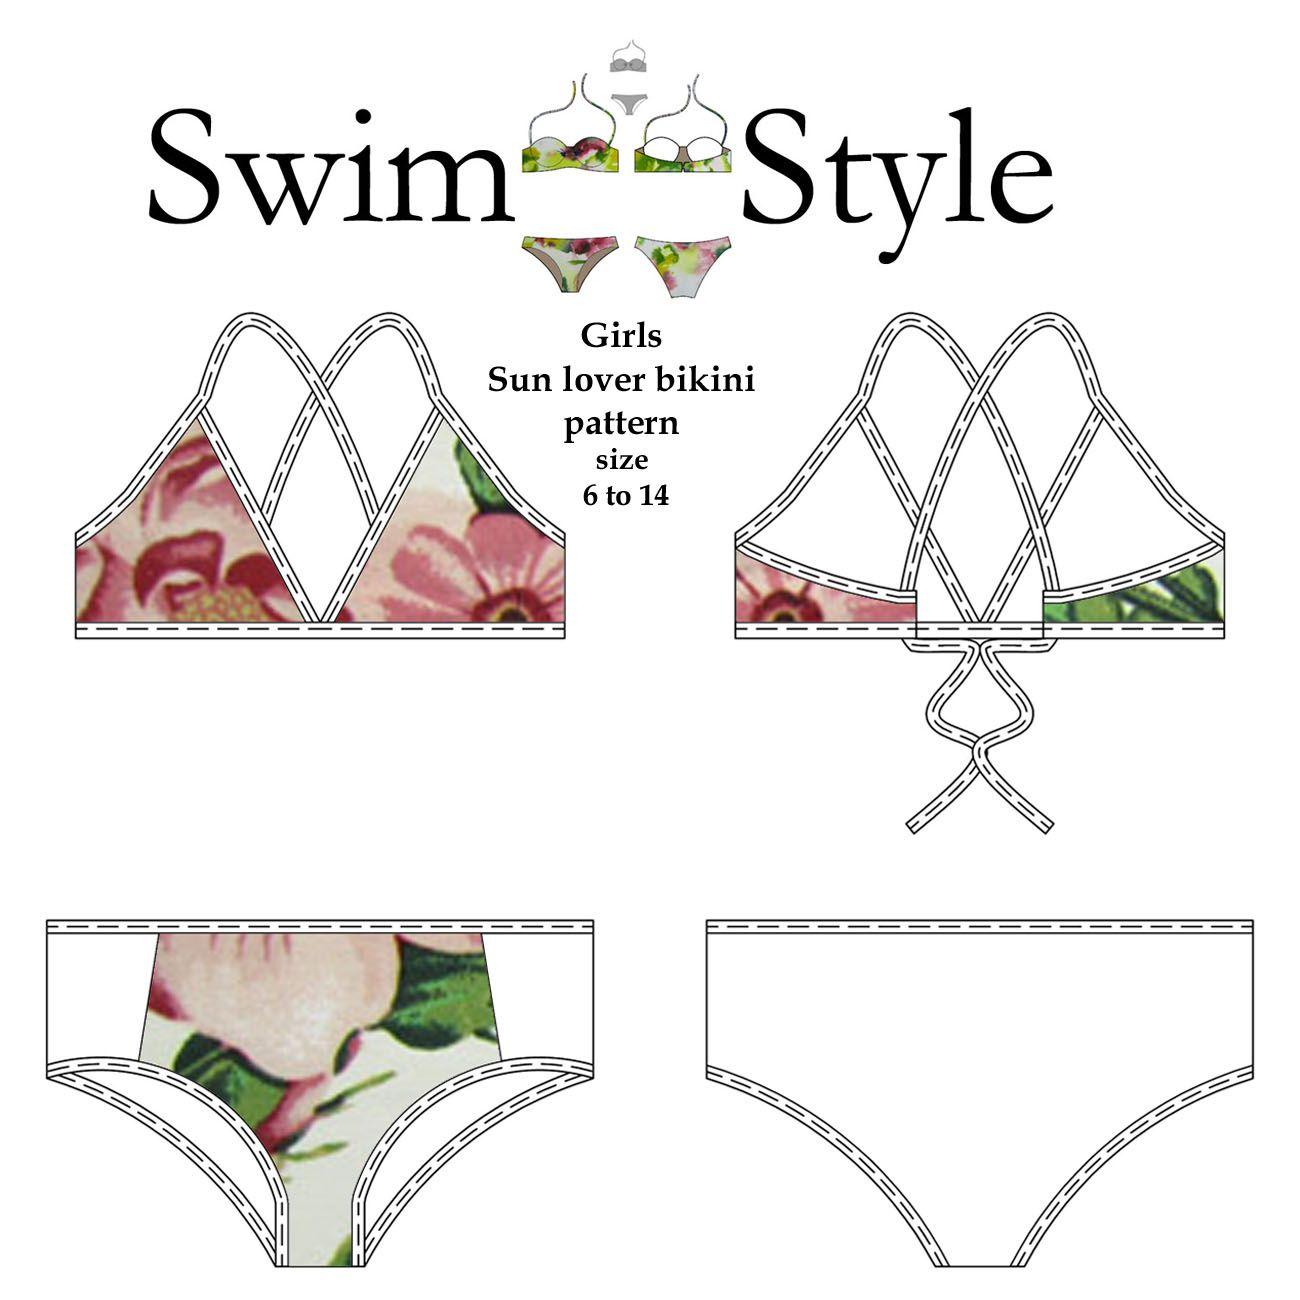 Atemberaubend Bikini Sewing Pattern Bilder - Strickmuster-Ideen ...